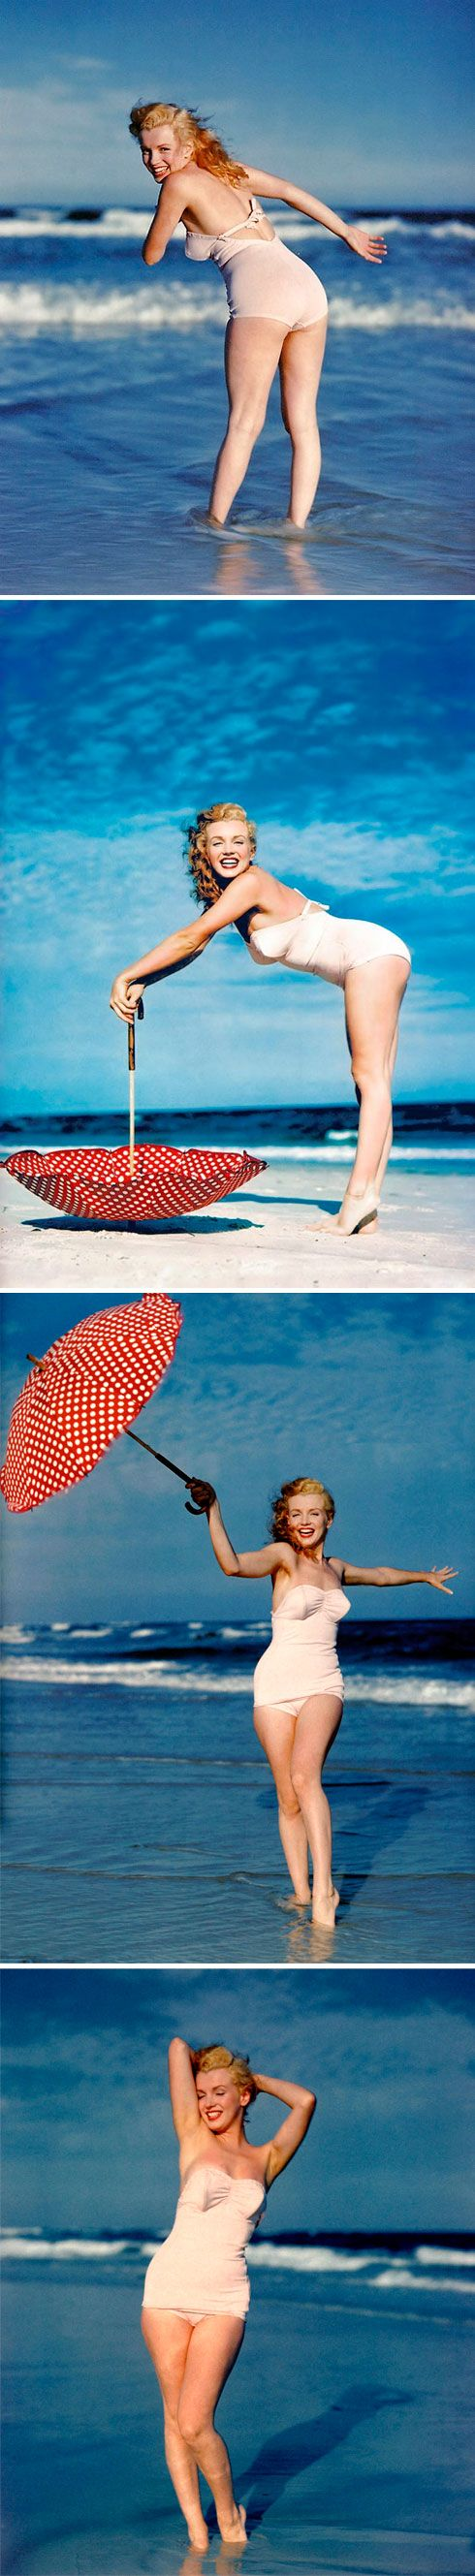 Marilyn Monroe - Tobay Beach, Long Island 1949 #MarilynMonroeSpasAtHyattRegencyMonterey: